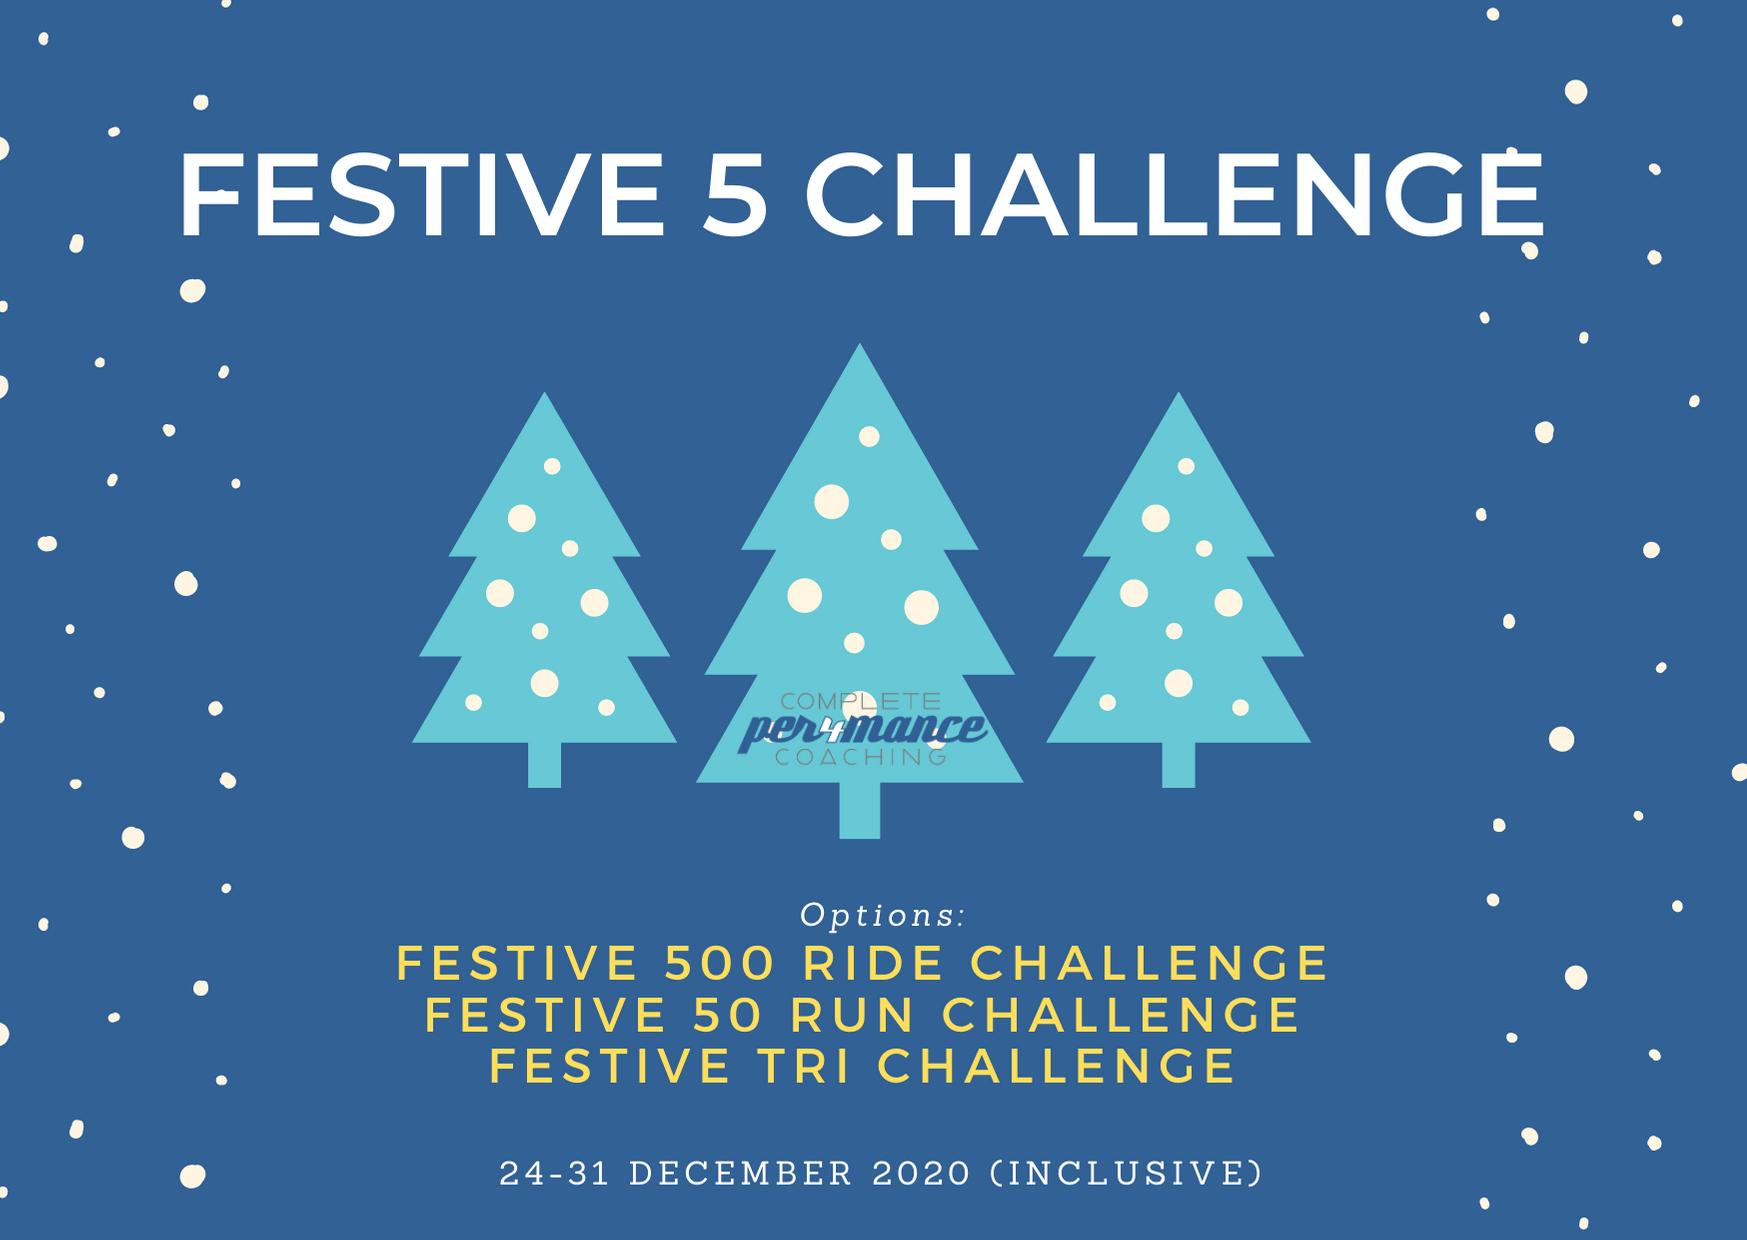 The Festive 5 Challenge